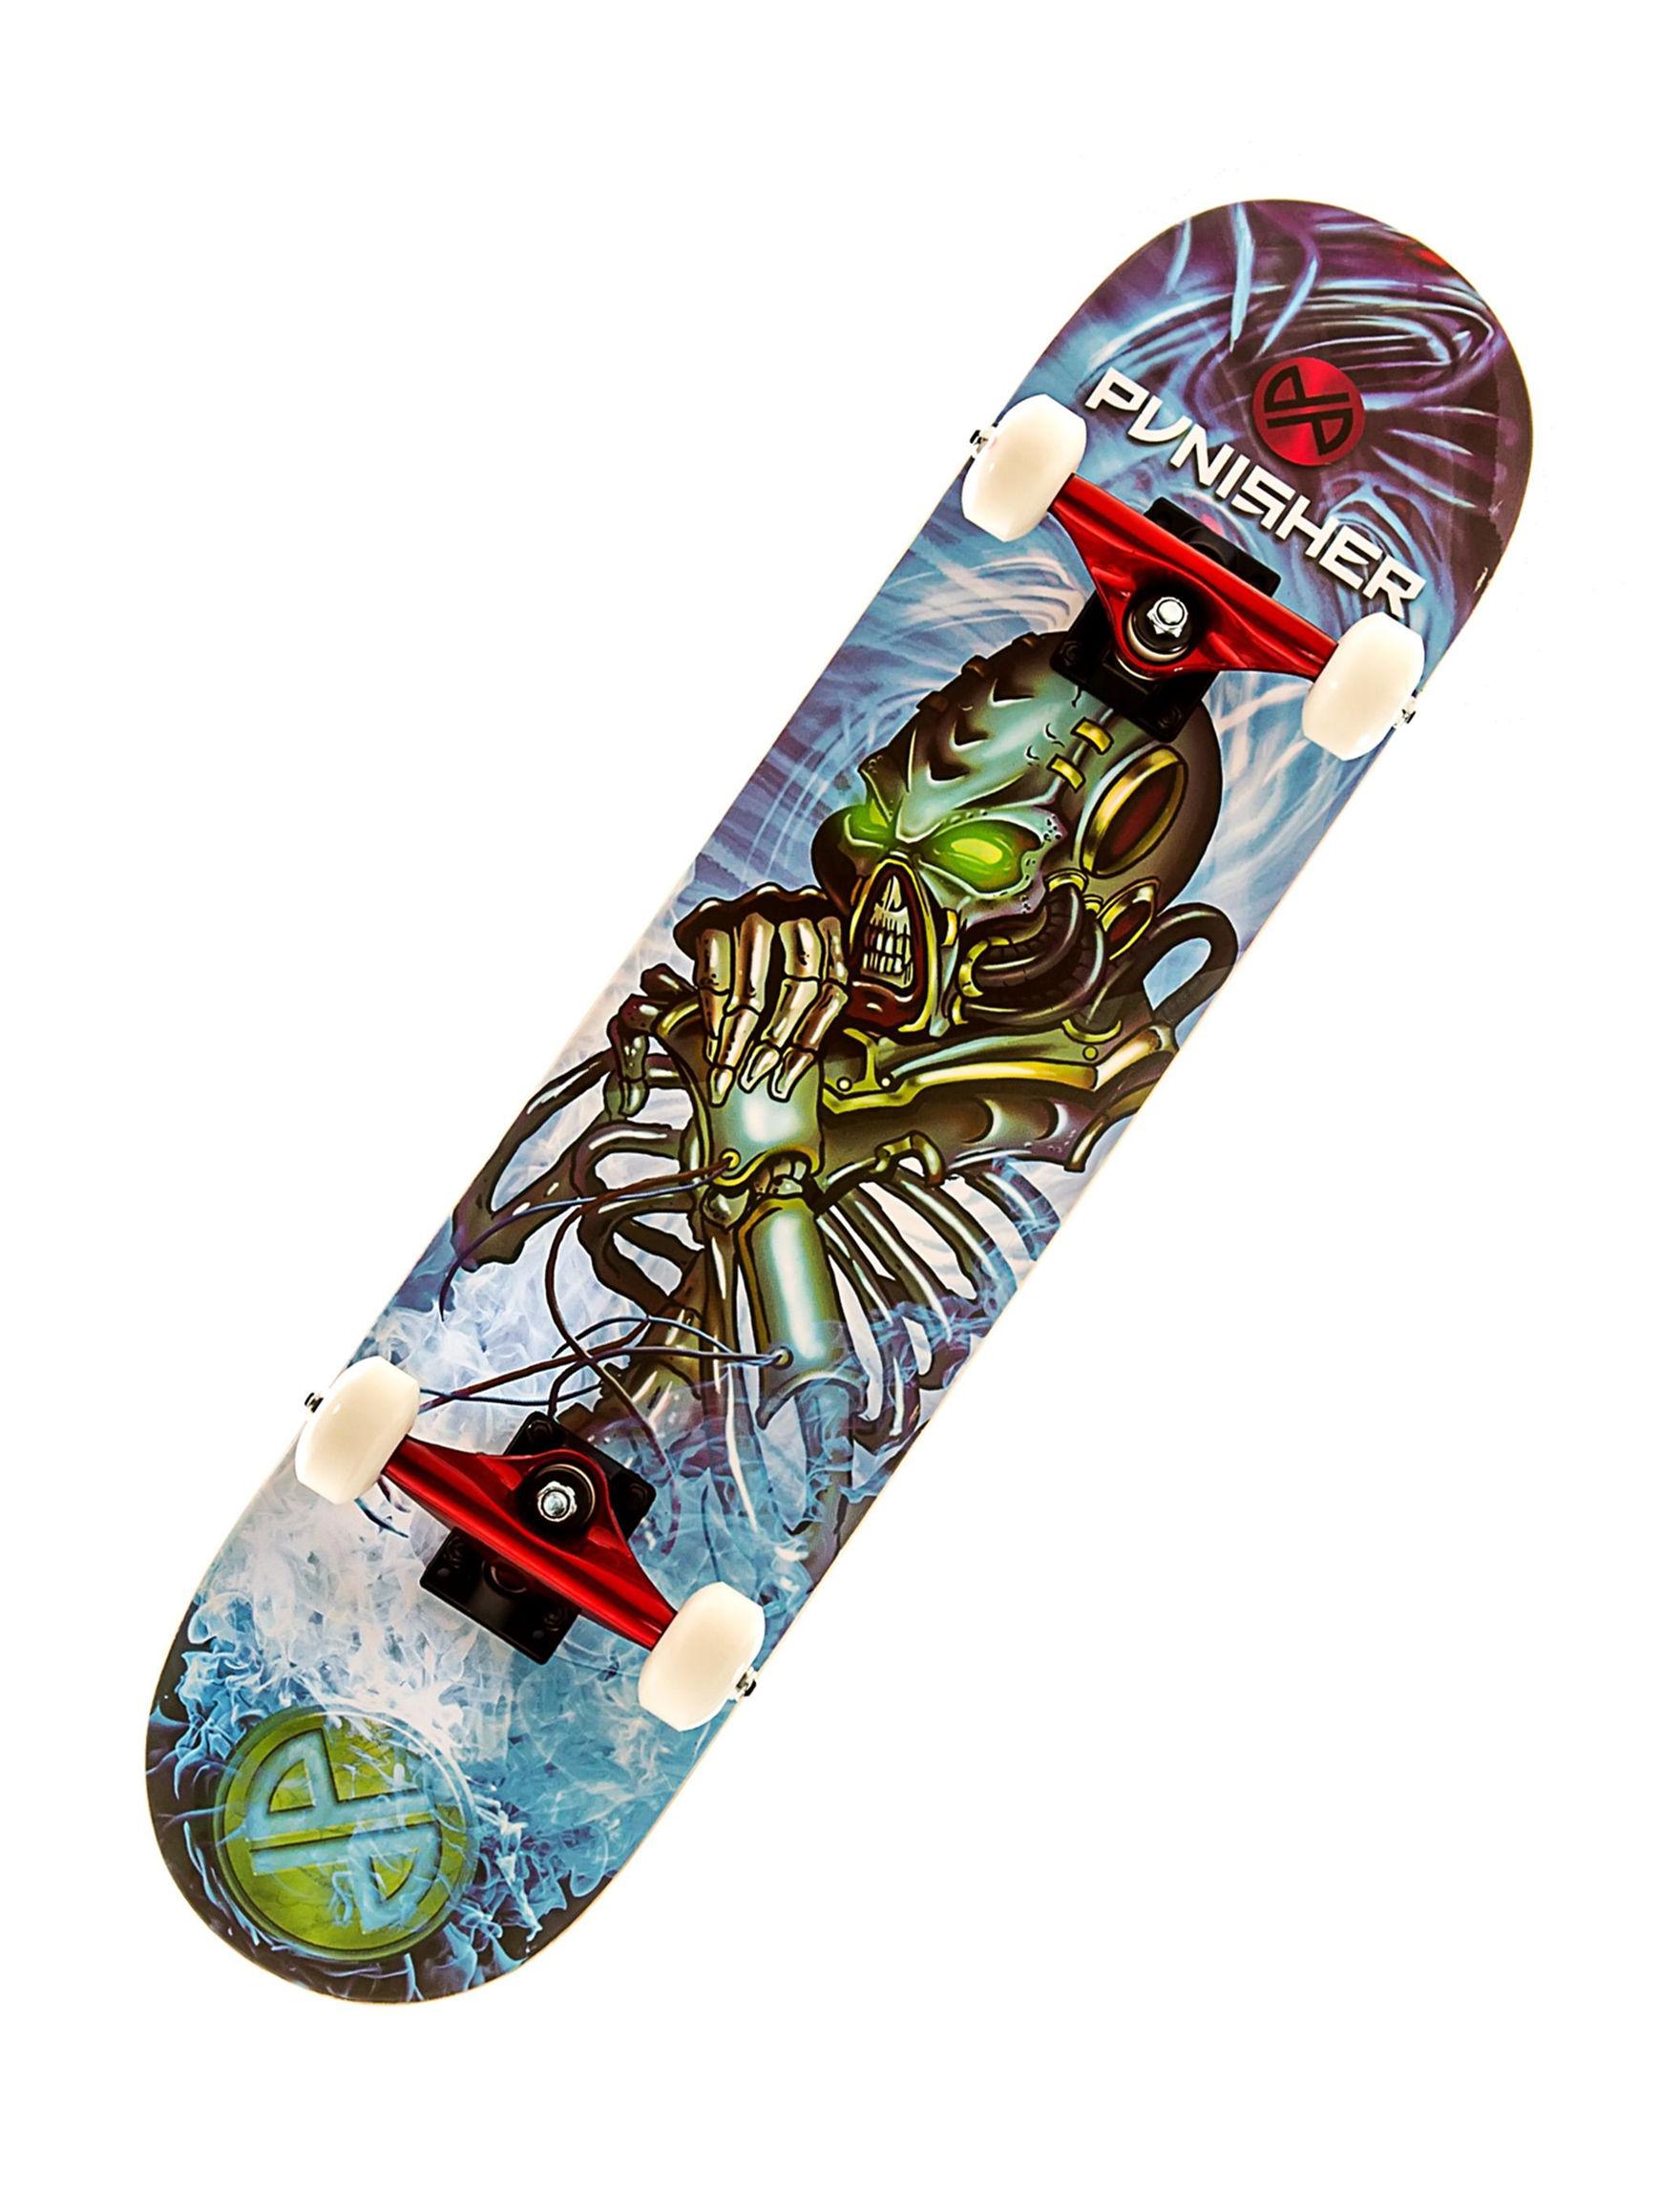 Punisher Skateboards Blue / Multi